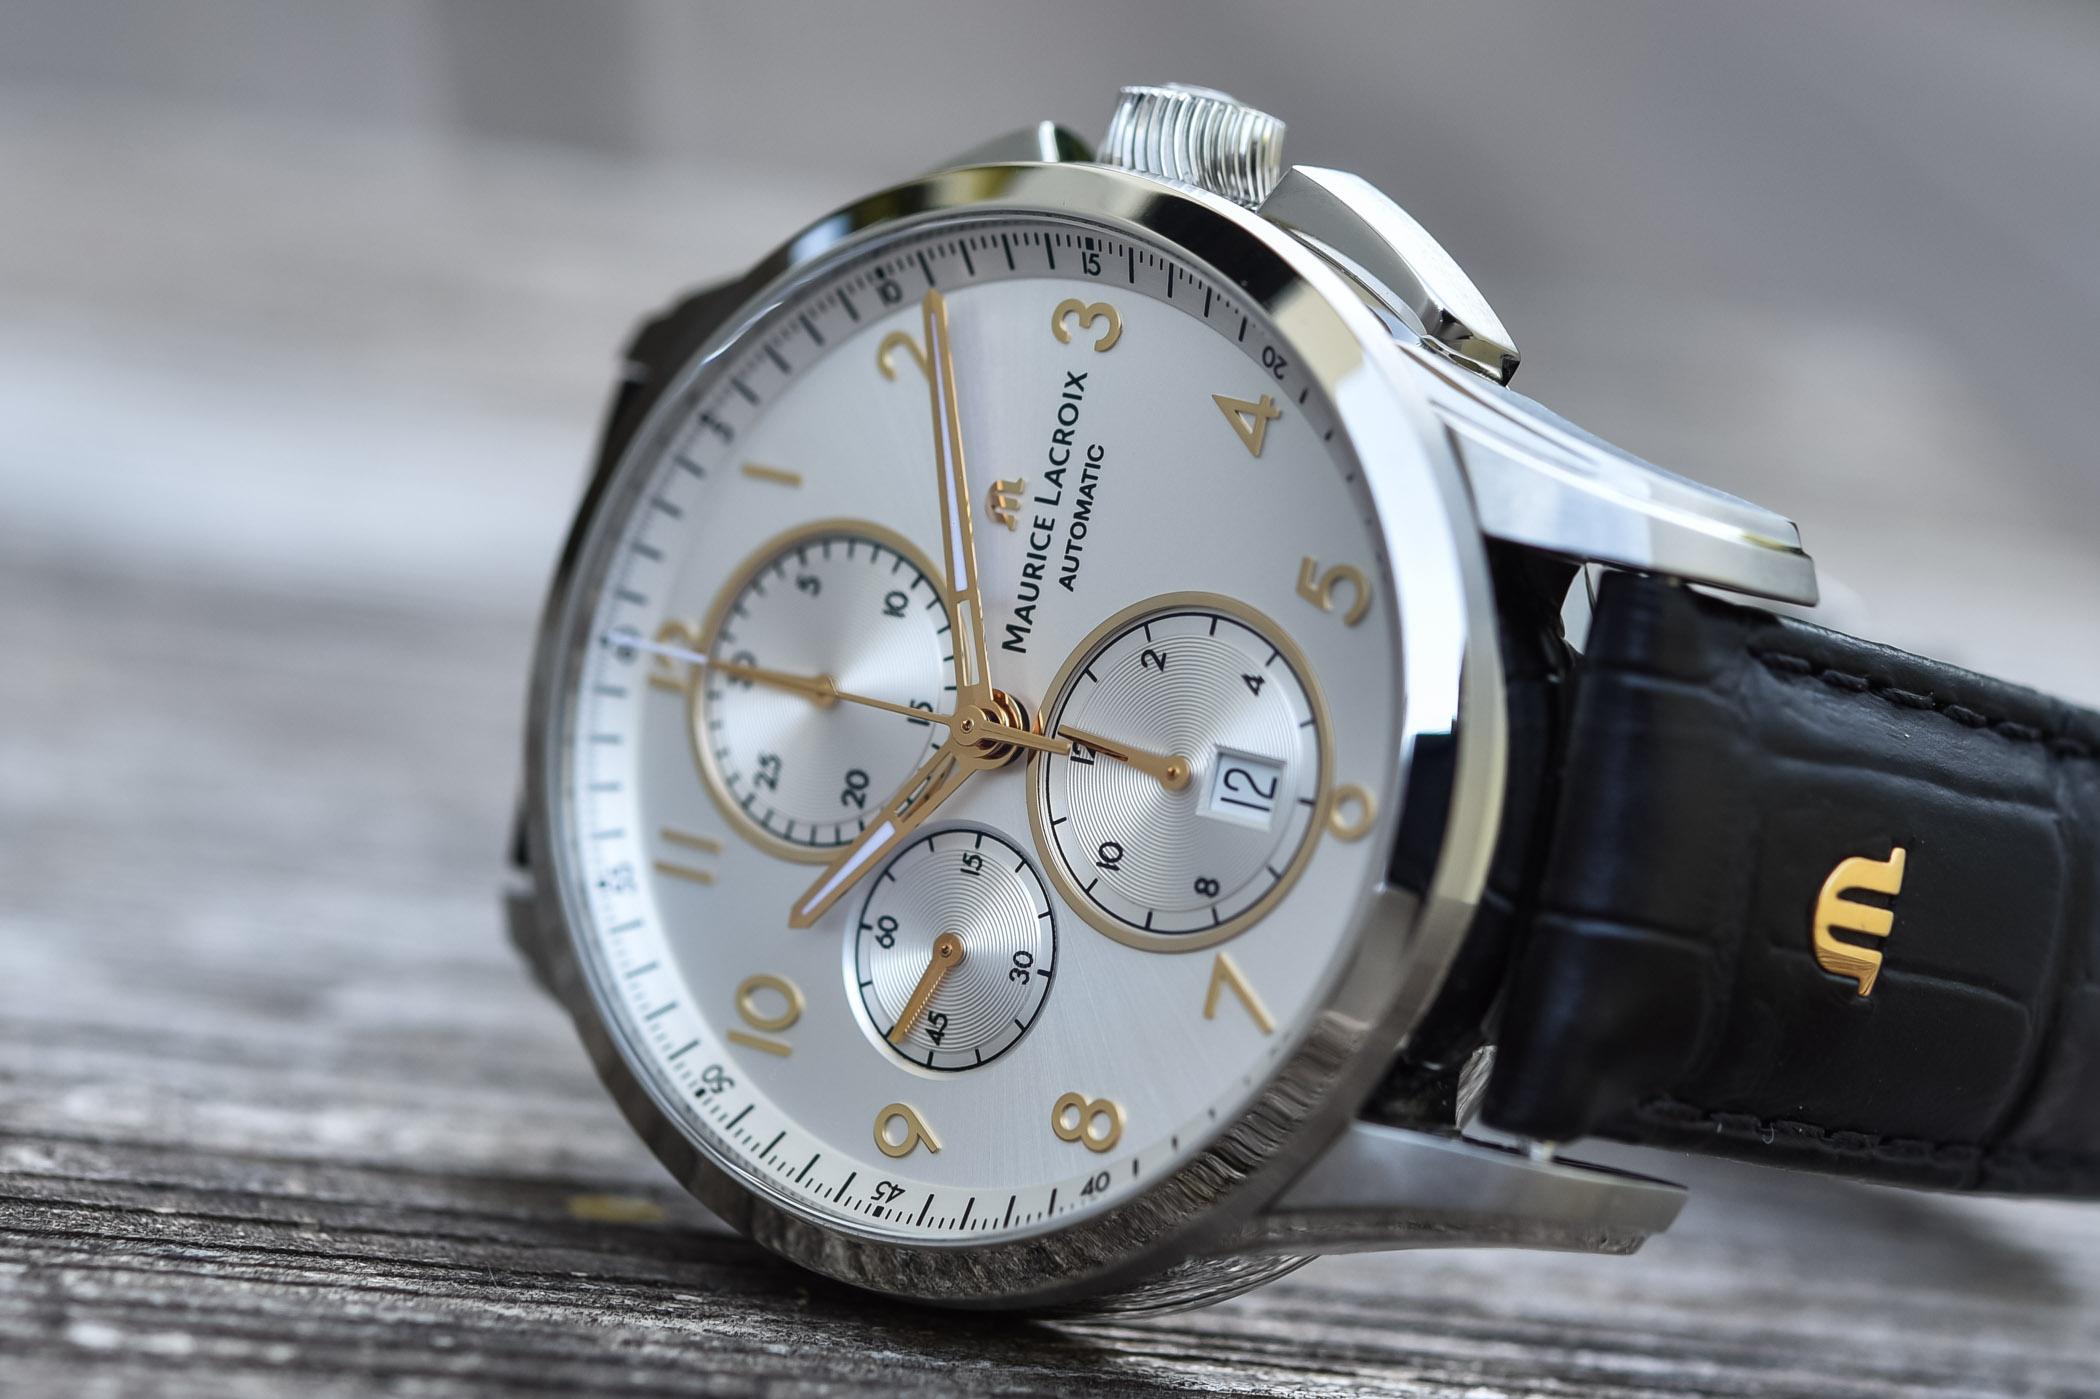 Maurice Lacroix Pontos Chronograph Automatic 2020 - 8